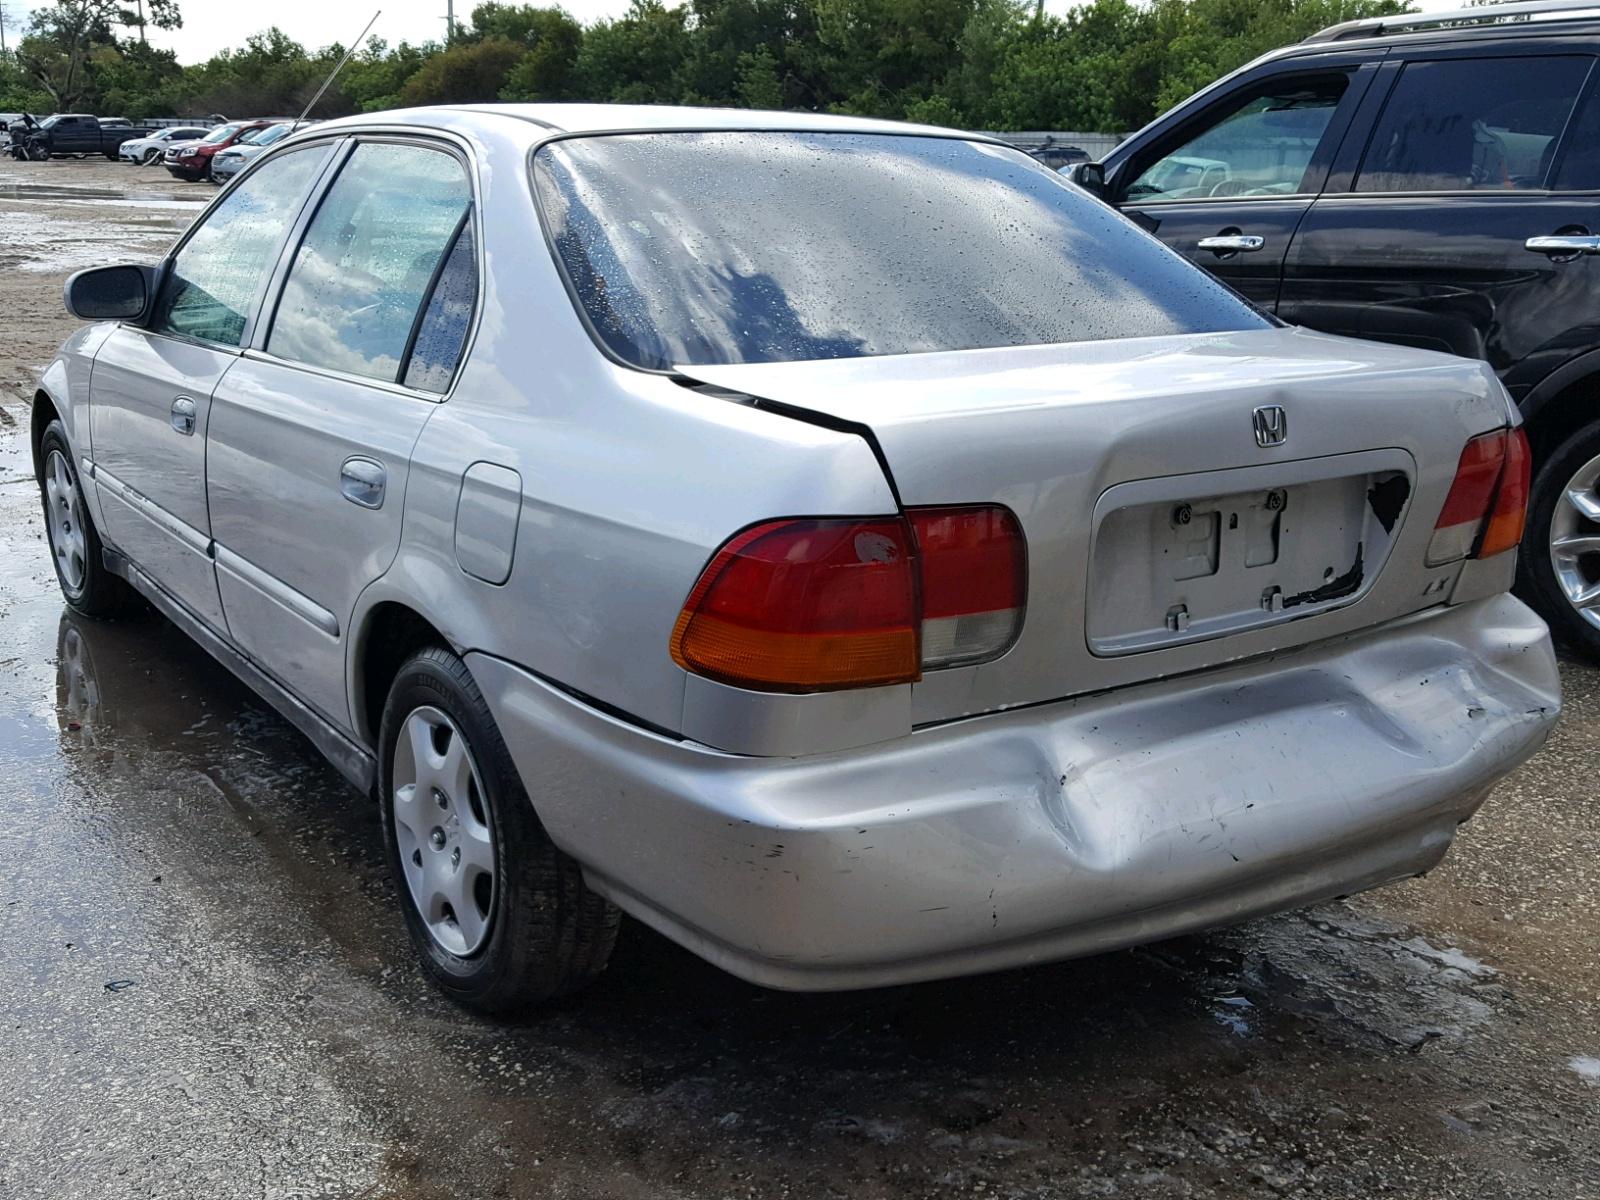 2hgej6573th521100 1996 Silver Honda Civic Lx On Sale In Fl Tampa 16l Angle View